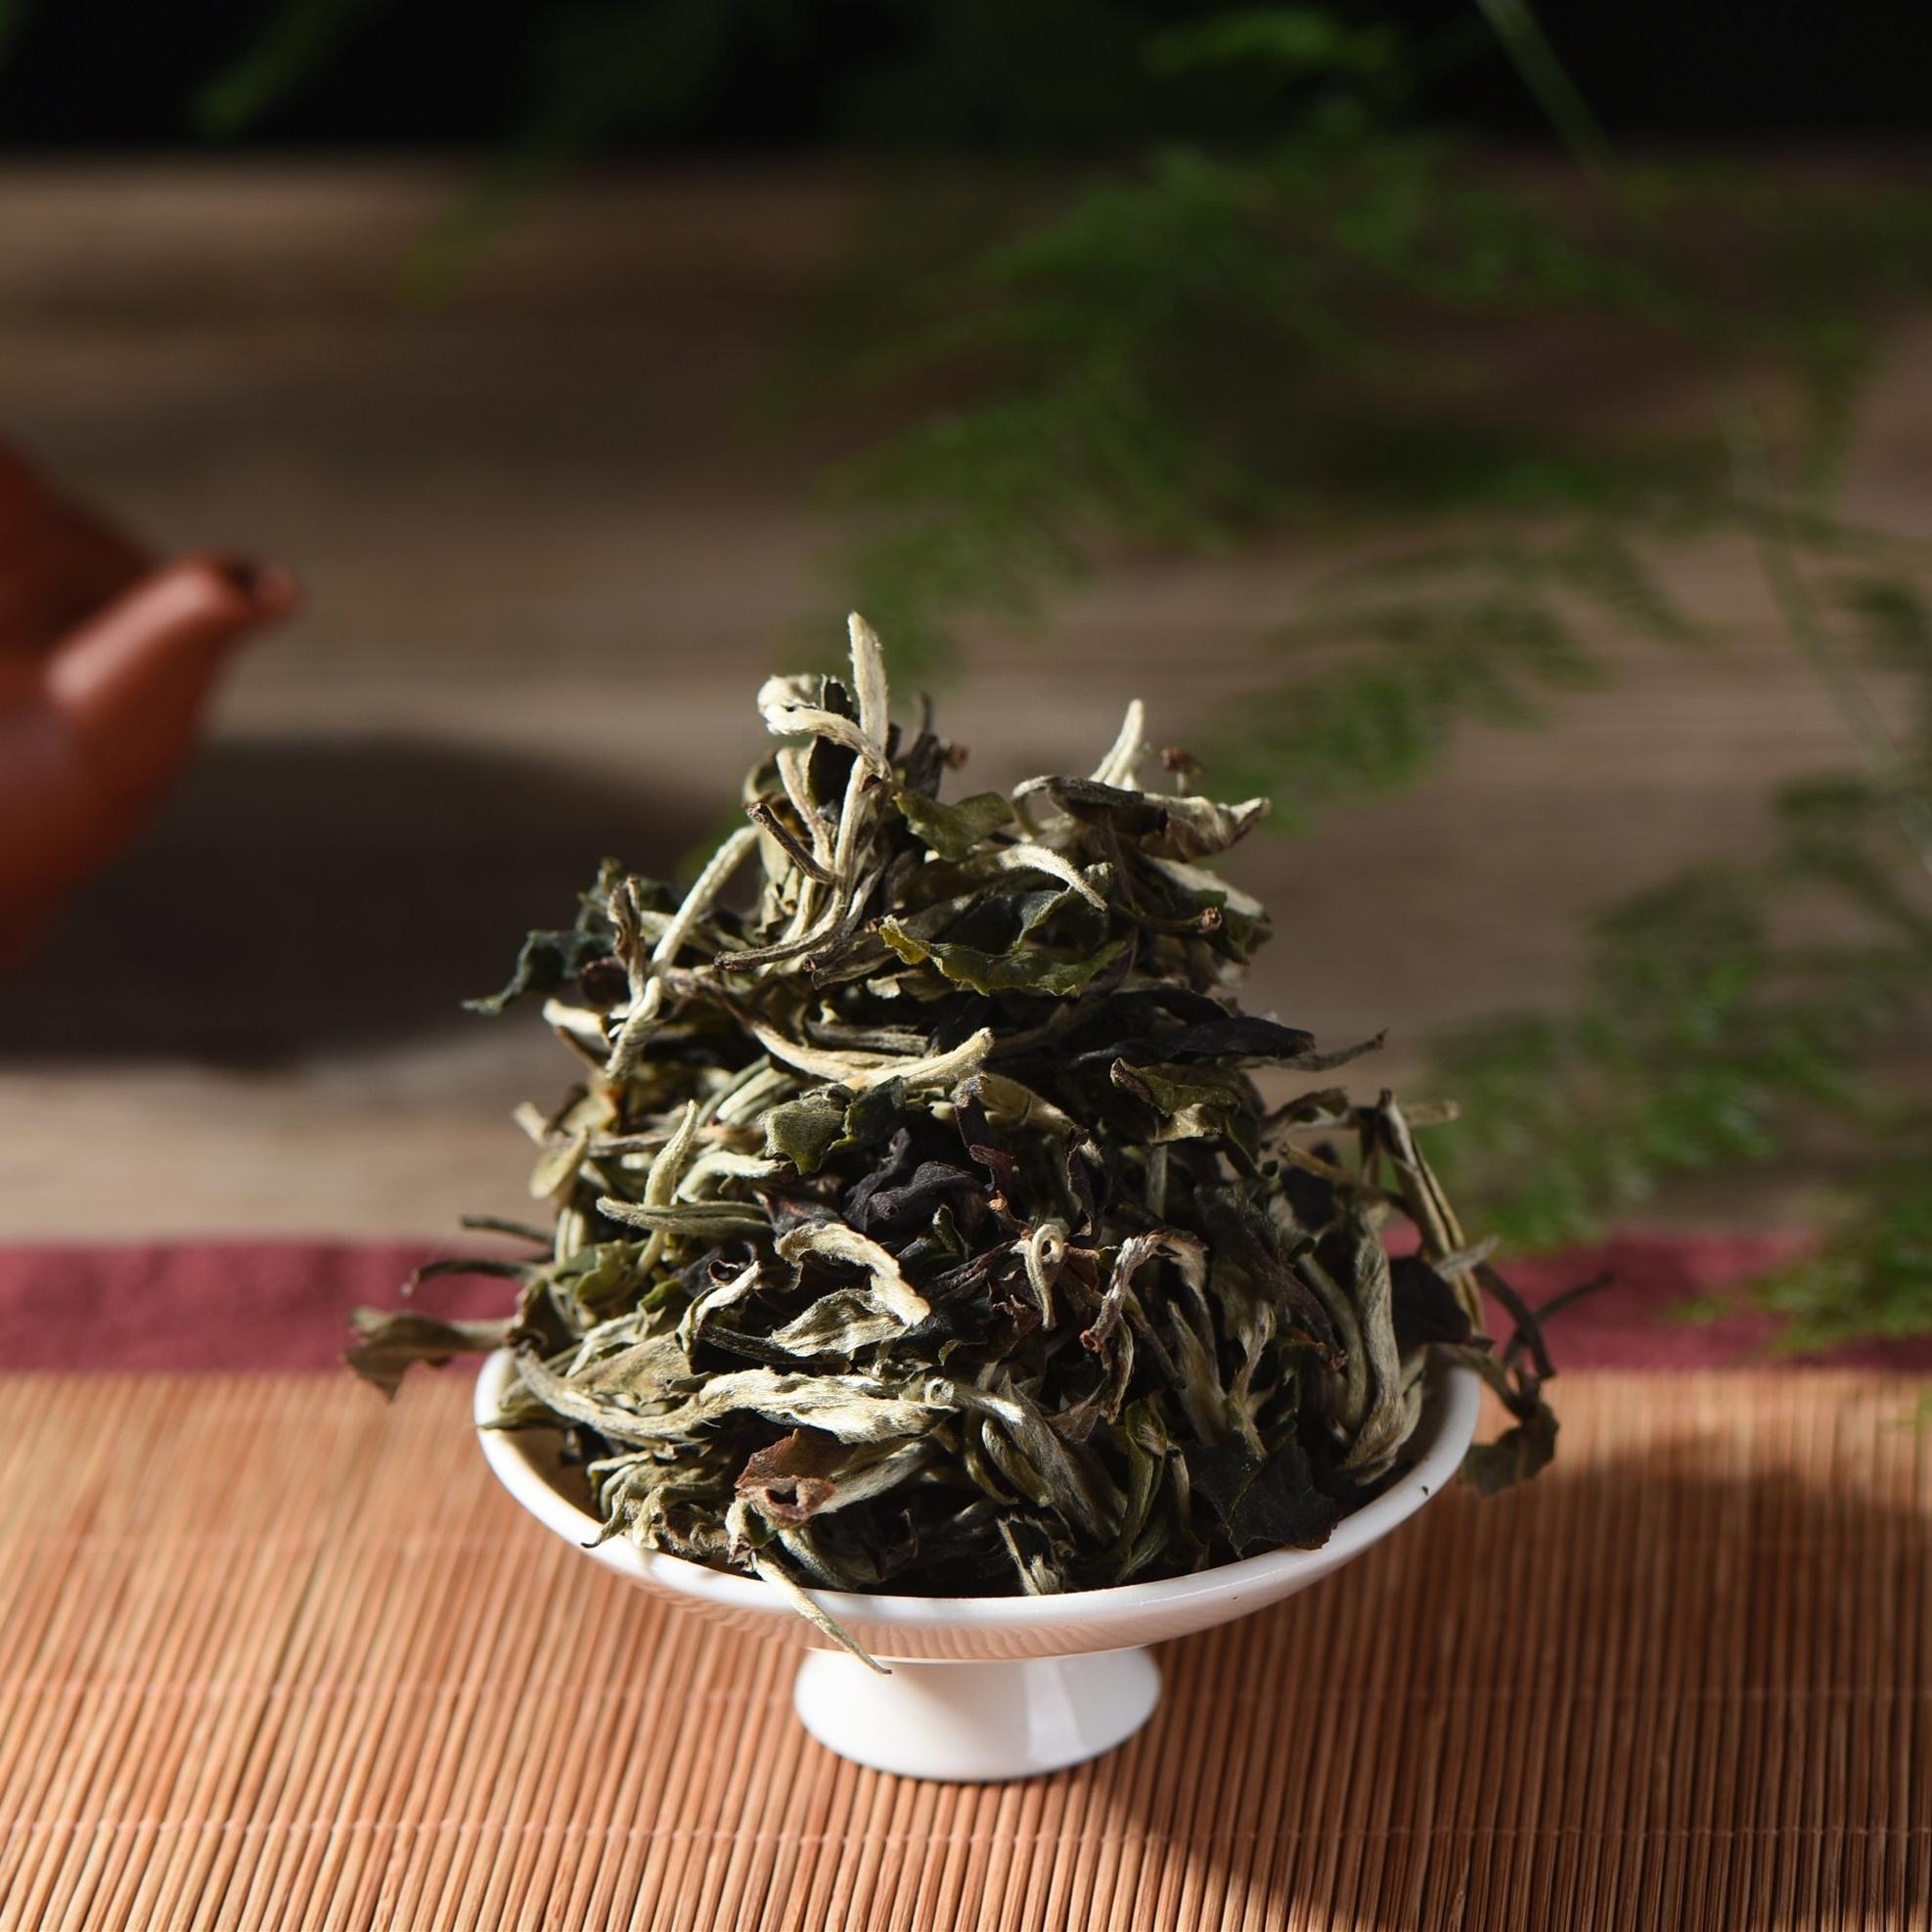 Wholesale the organic yunnan loose leaf white tea ECCERT certificate - 4uTea   4uTea.com